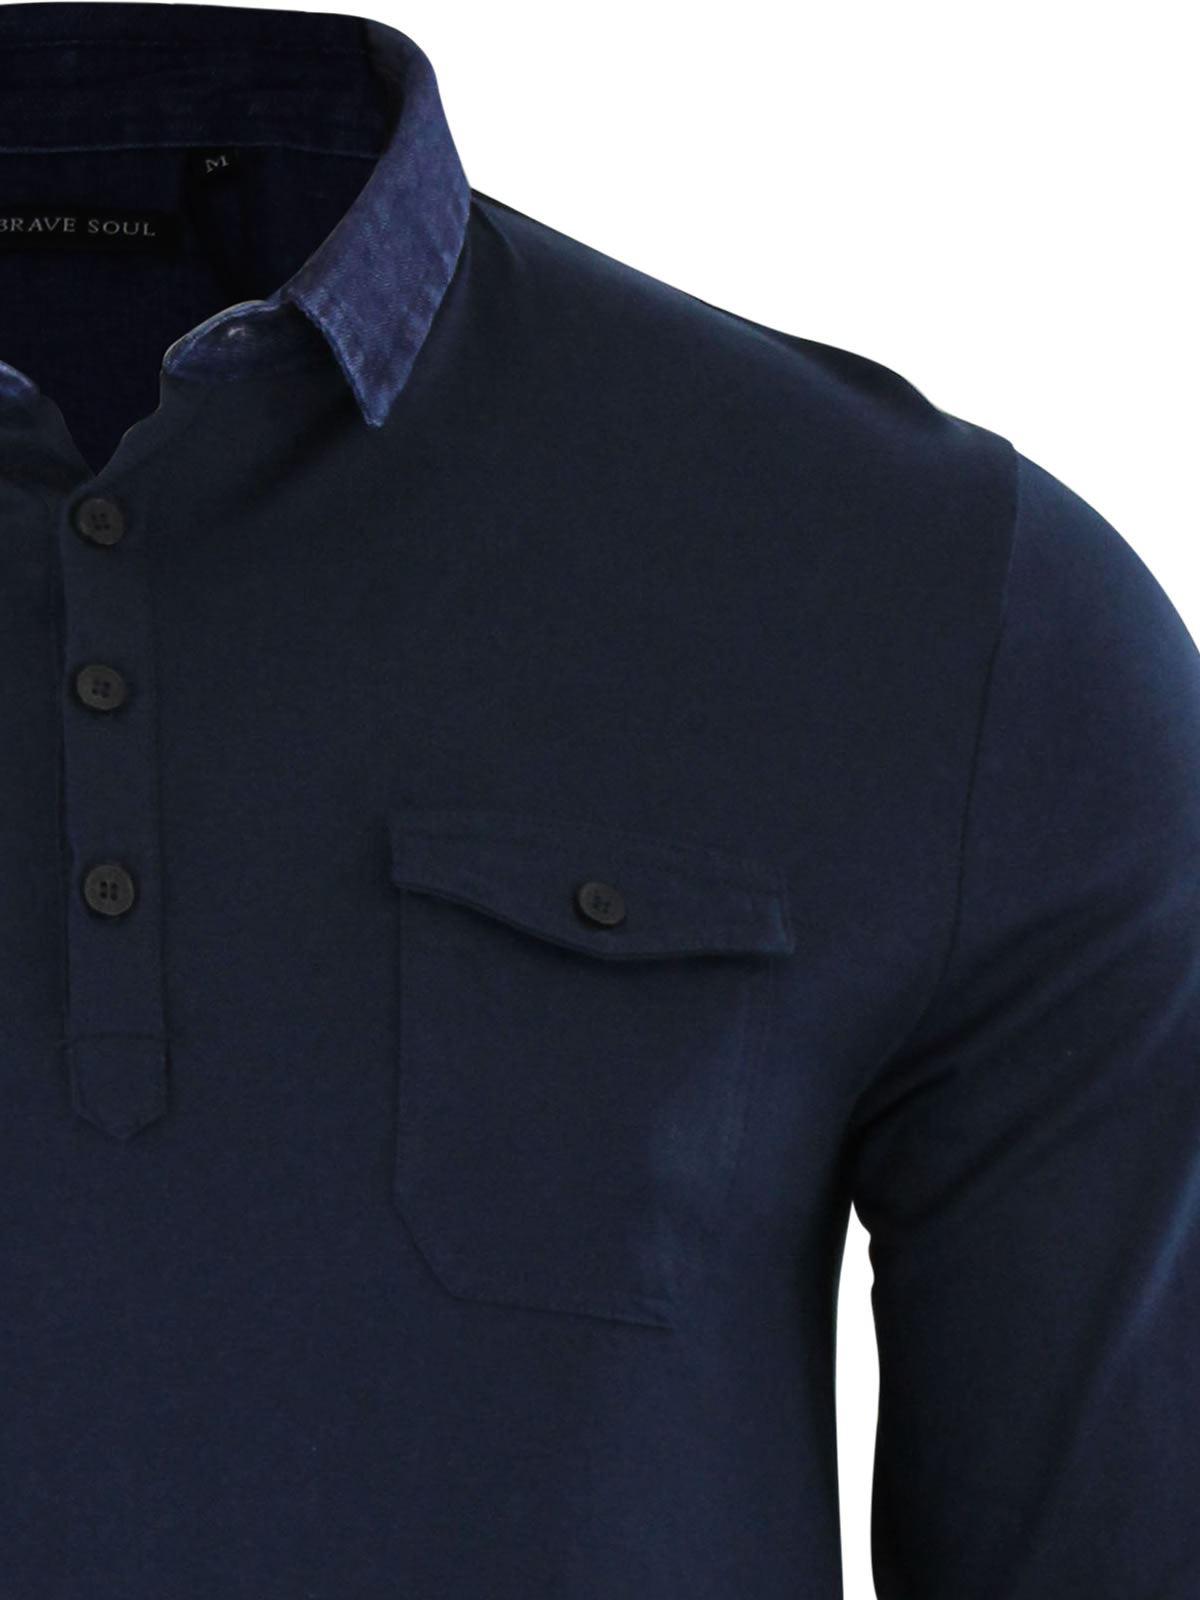 Brave-Soul-Gospel-Homme-Polo-T-Shirt-Denim-a-col-a-manches-longues-Top-Casual miniature 4